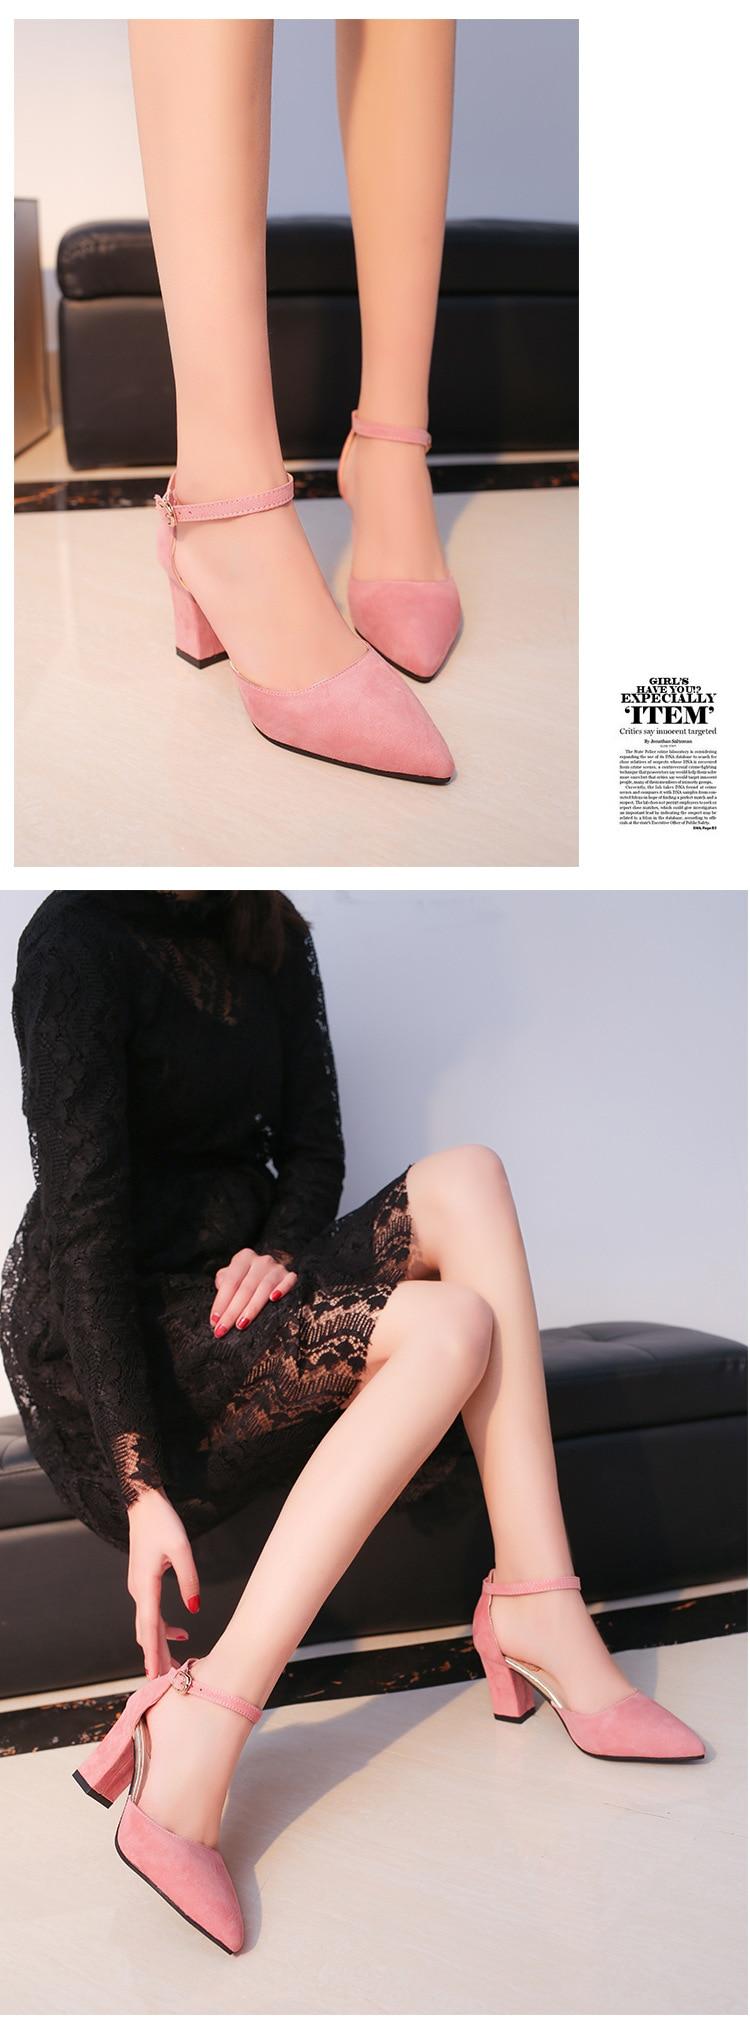 HTB1zGCoXyMnBKNjSZFoq6zOSFXaQ 2019 Fashion High Heels Newest Women Pumps Summer Women Shoes Thick Heel Pumps Comfortable Shoes Woman Platform Shoes s0013